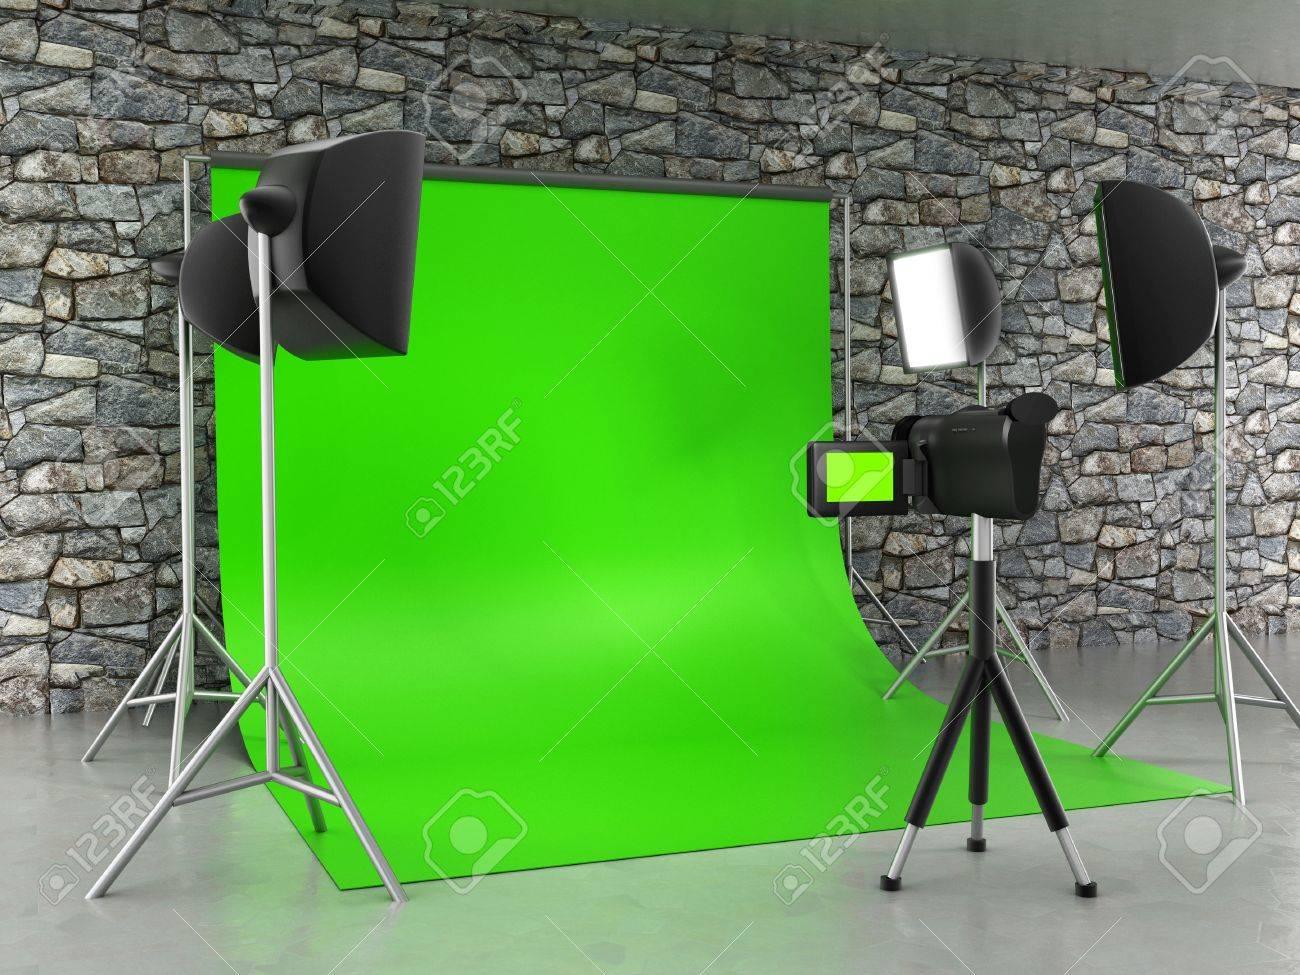 Greenscreen studio setup Stock Photo - 32056573